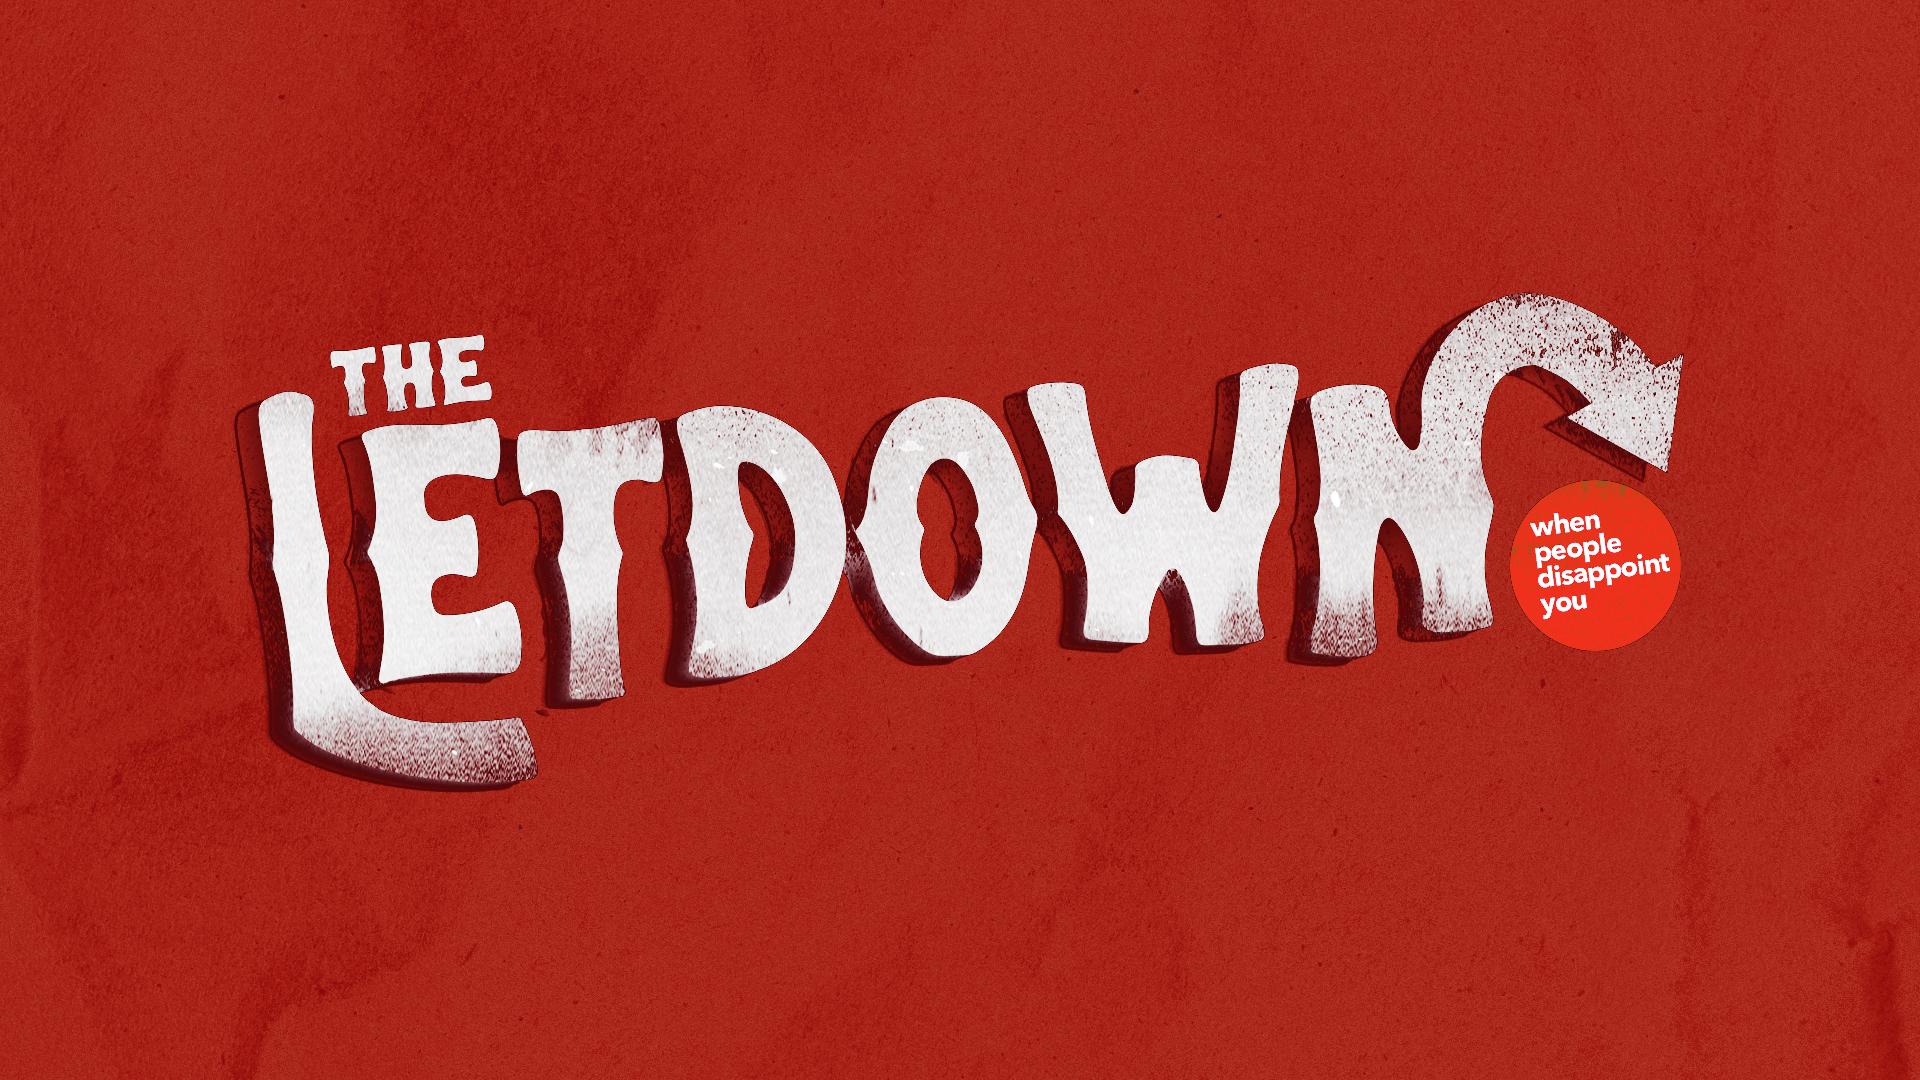 The-Letdown_Title-Slide.jpg